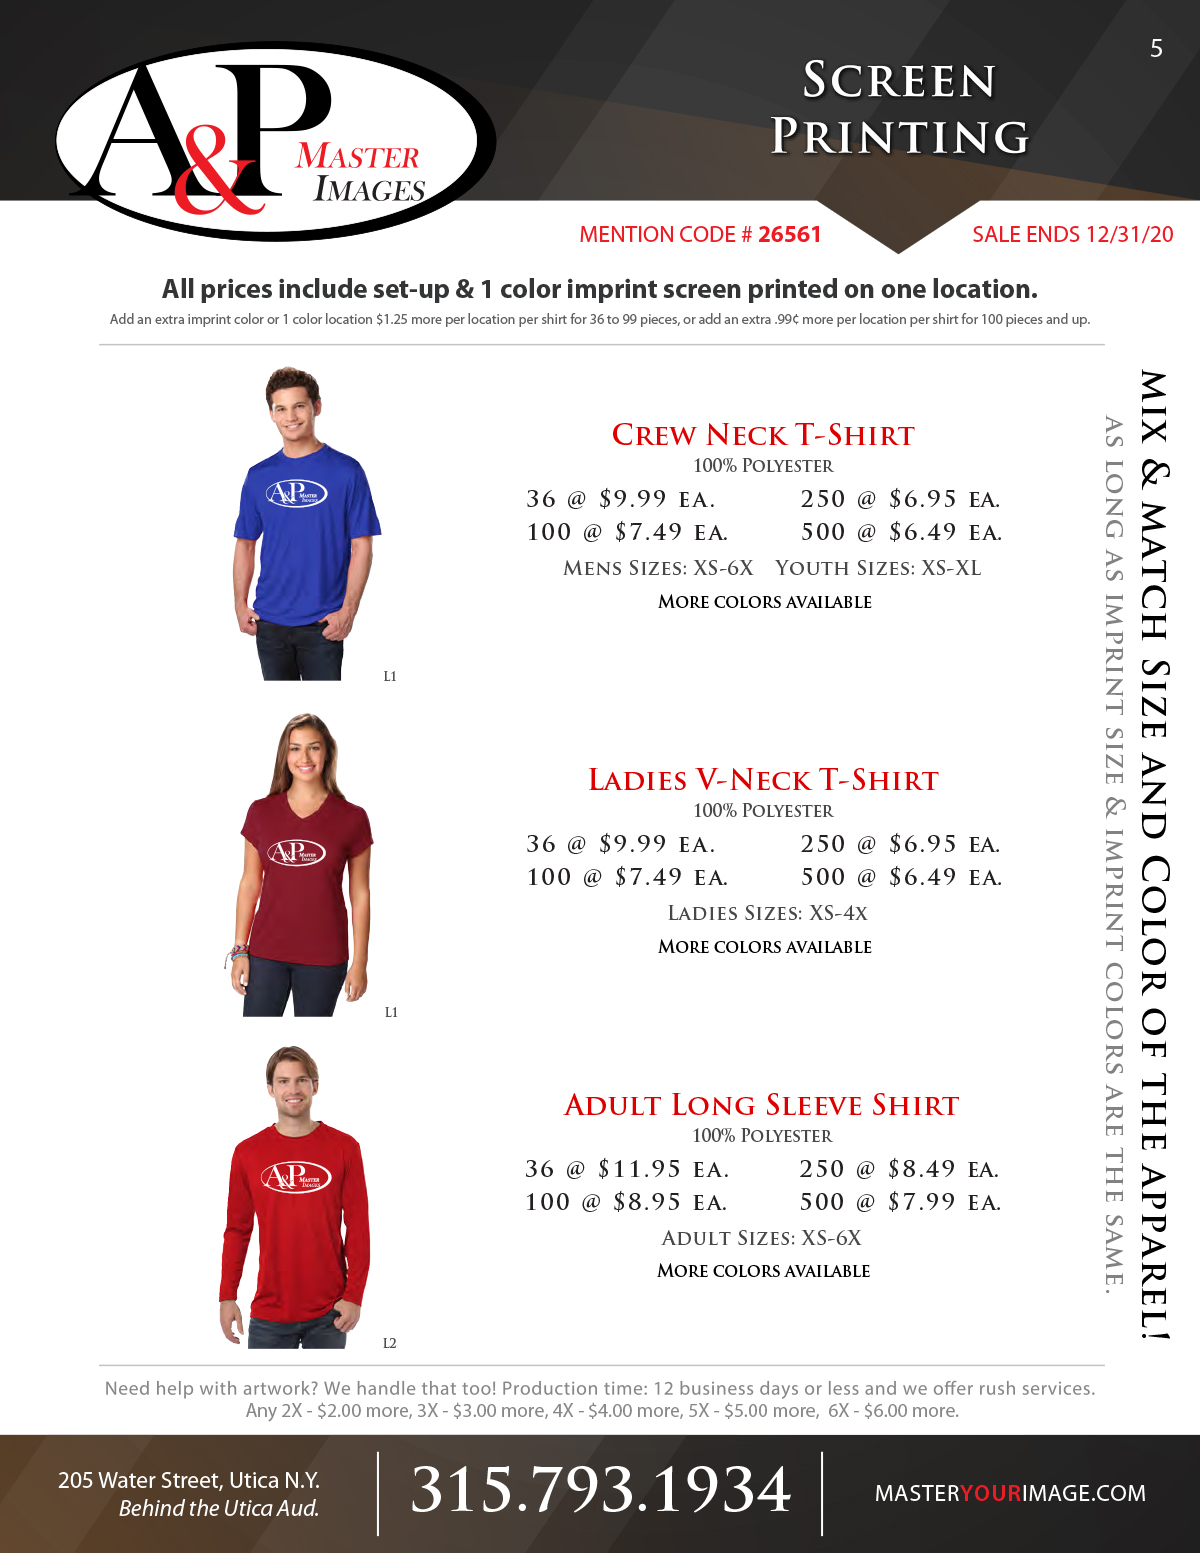 Sales Flyers - Screen Printing 05